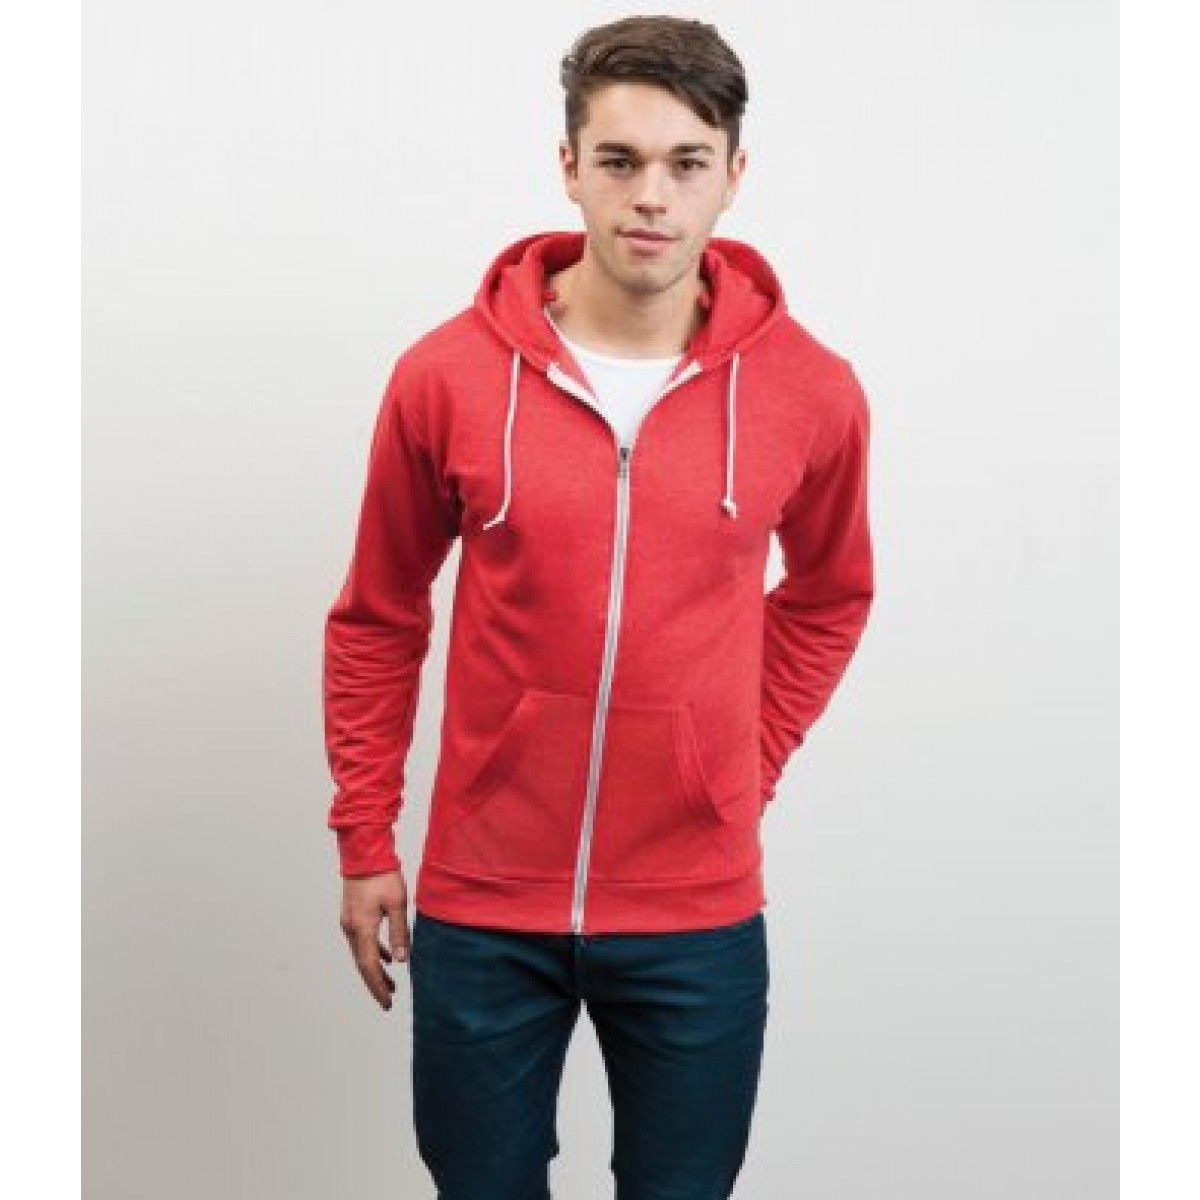 AWDis Hoodie for Personalised Clothing c6ecb7919